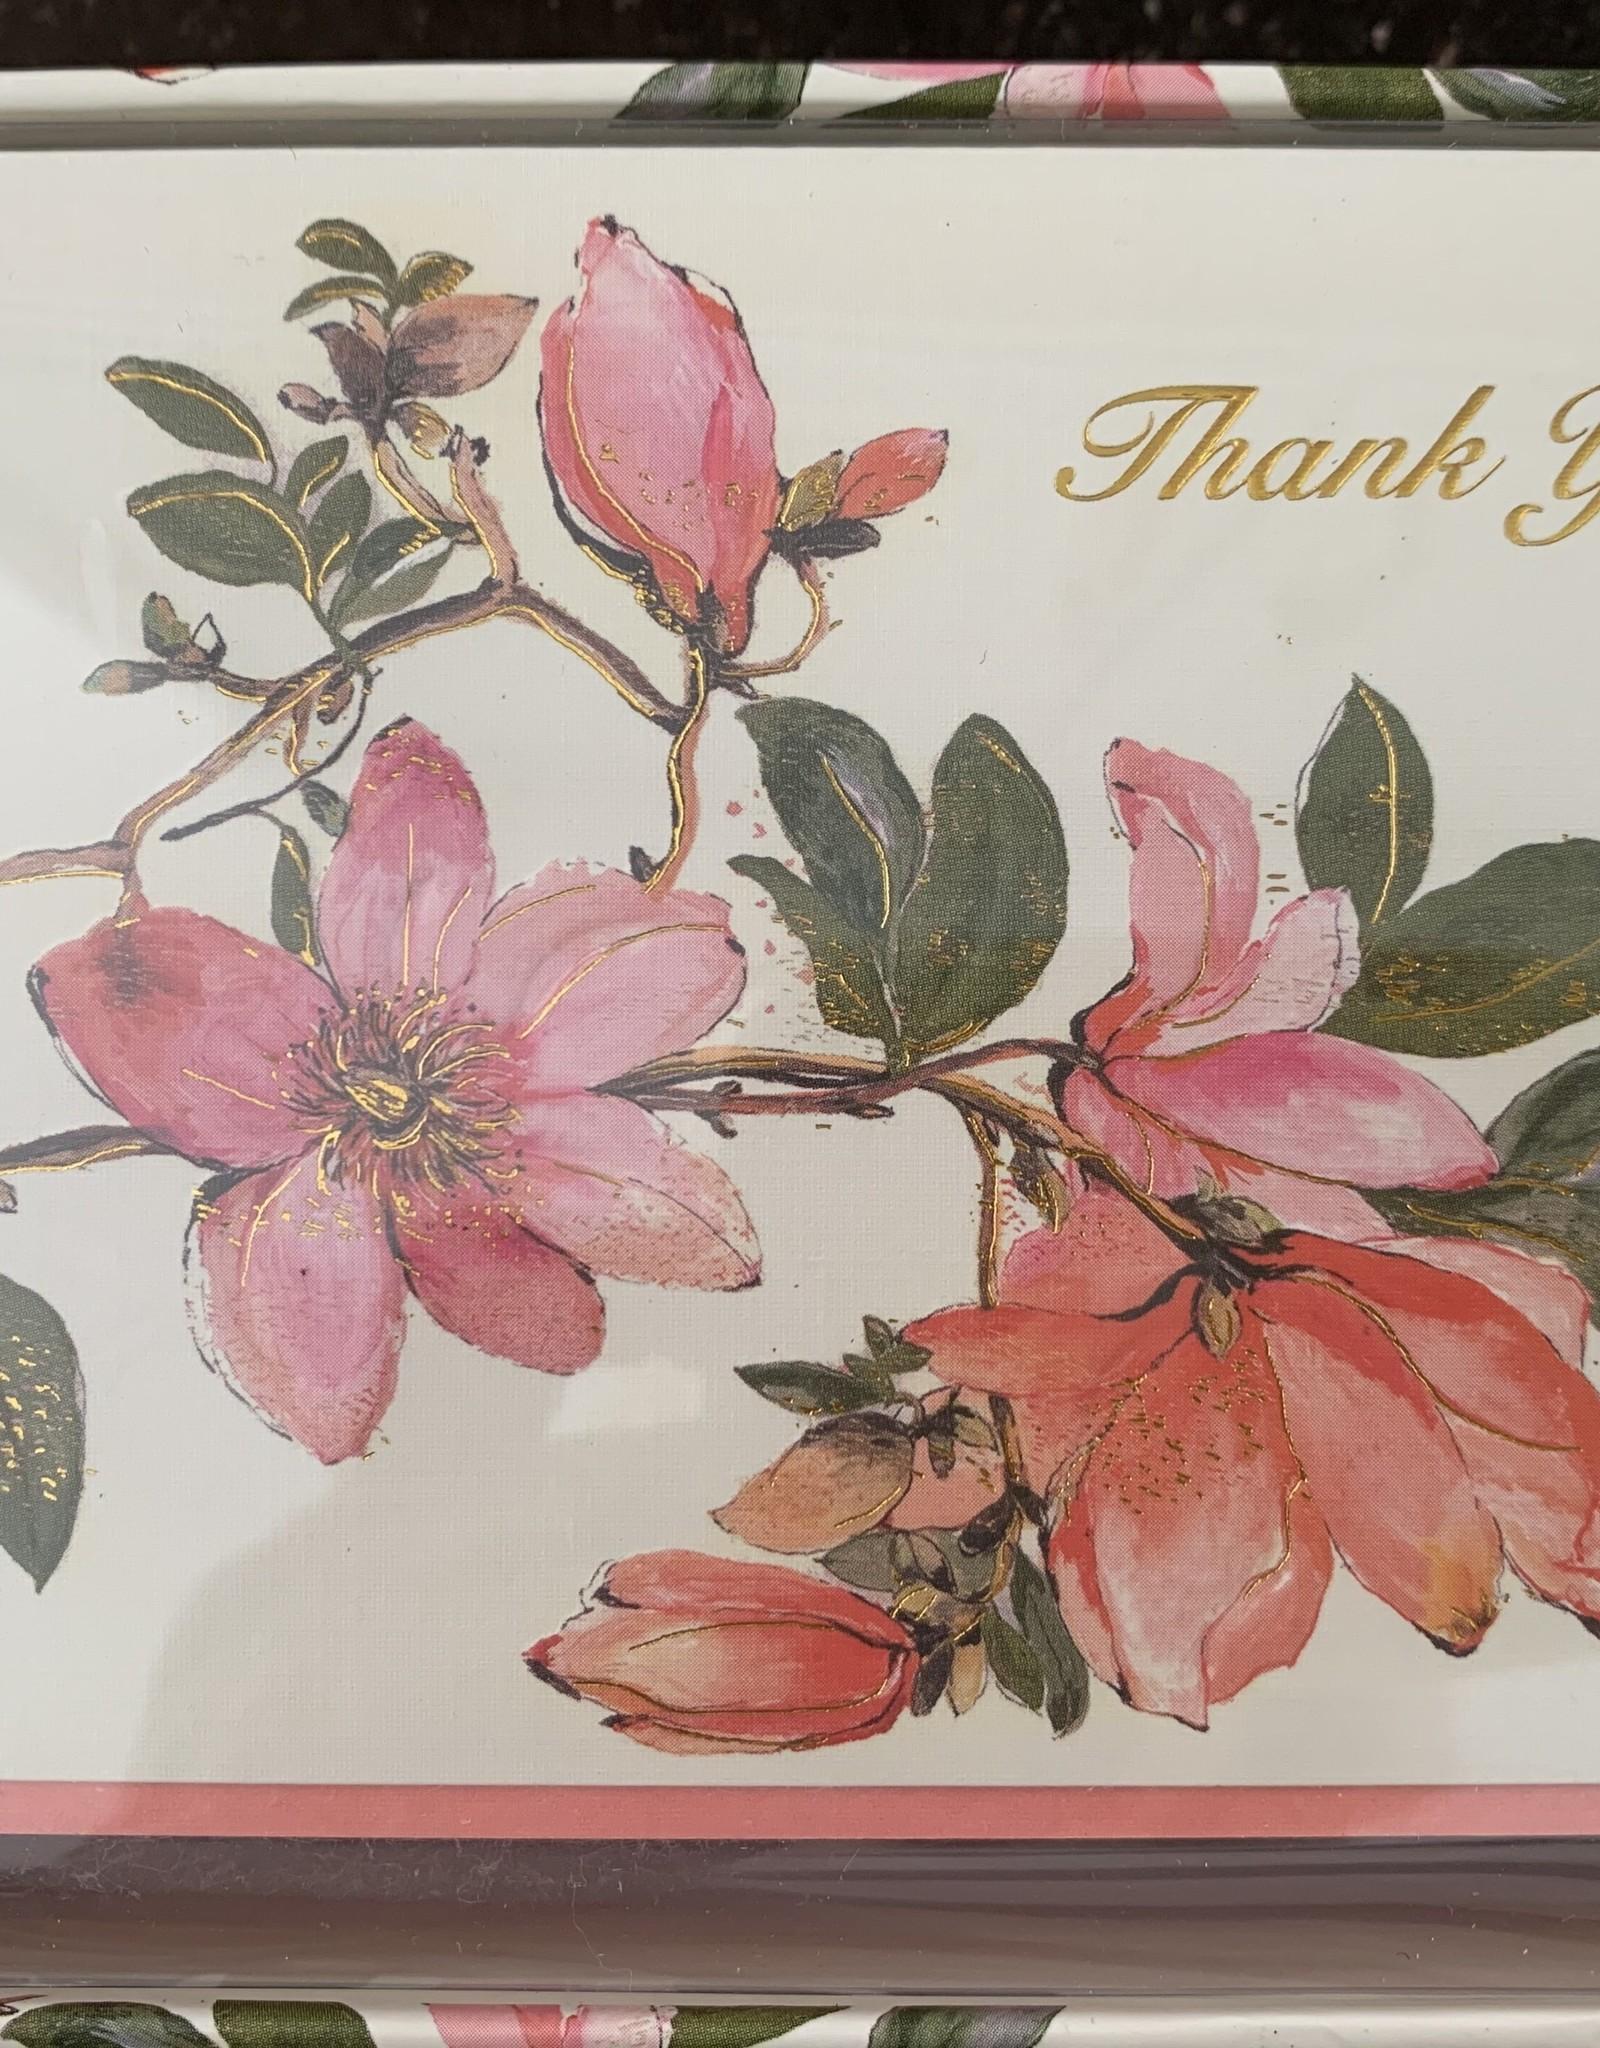 PETER PAUPER PRESS Thank You Notecards - Magnolia